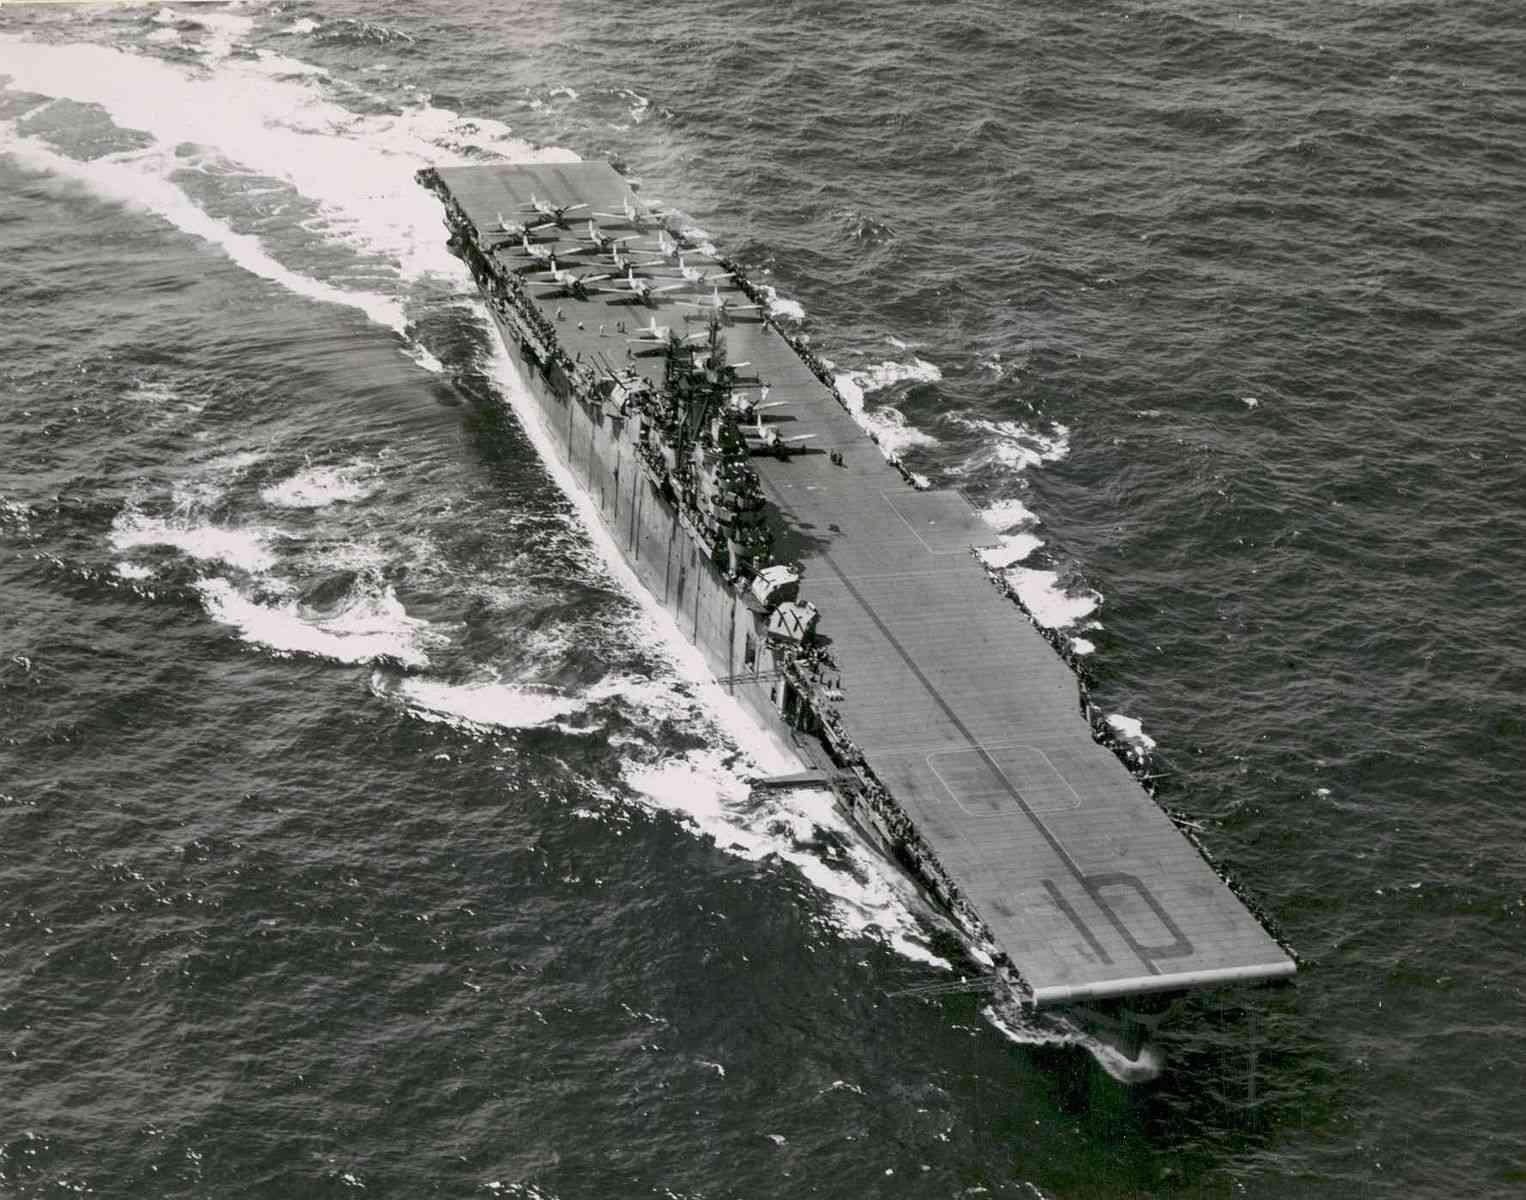 USS_Yorktown_CV-10_1943_aerial_with_F6Fs